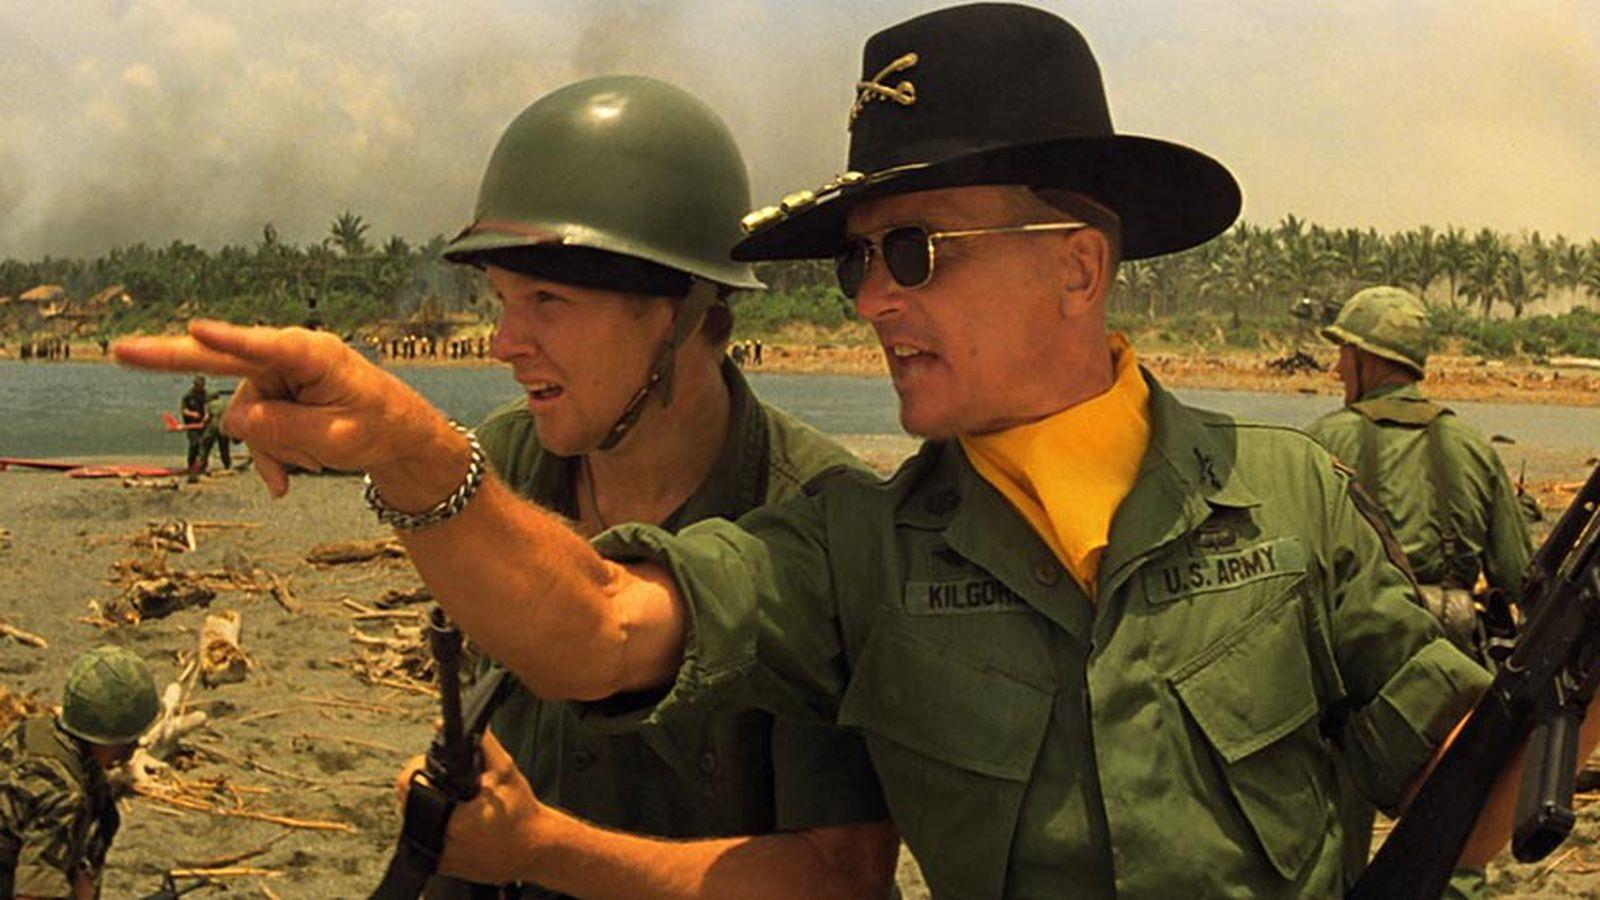 Francis Ford Coppola is kickstarting an Apocalypse Now